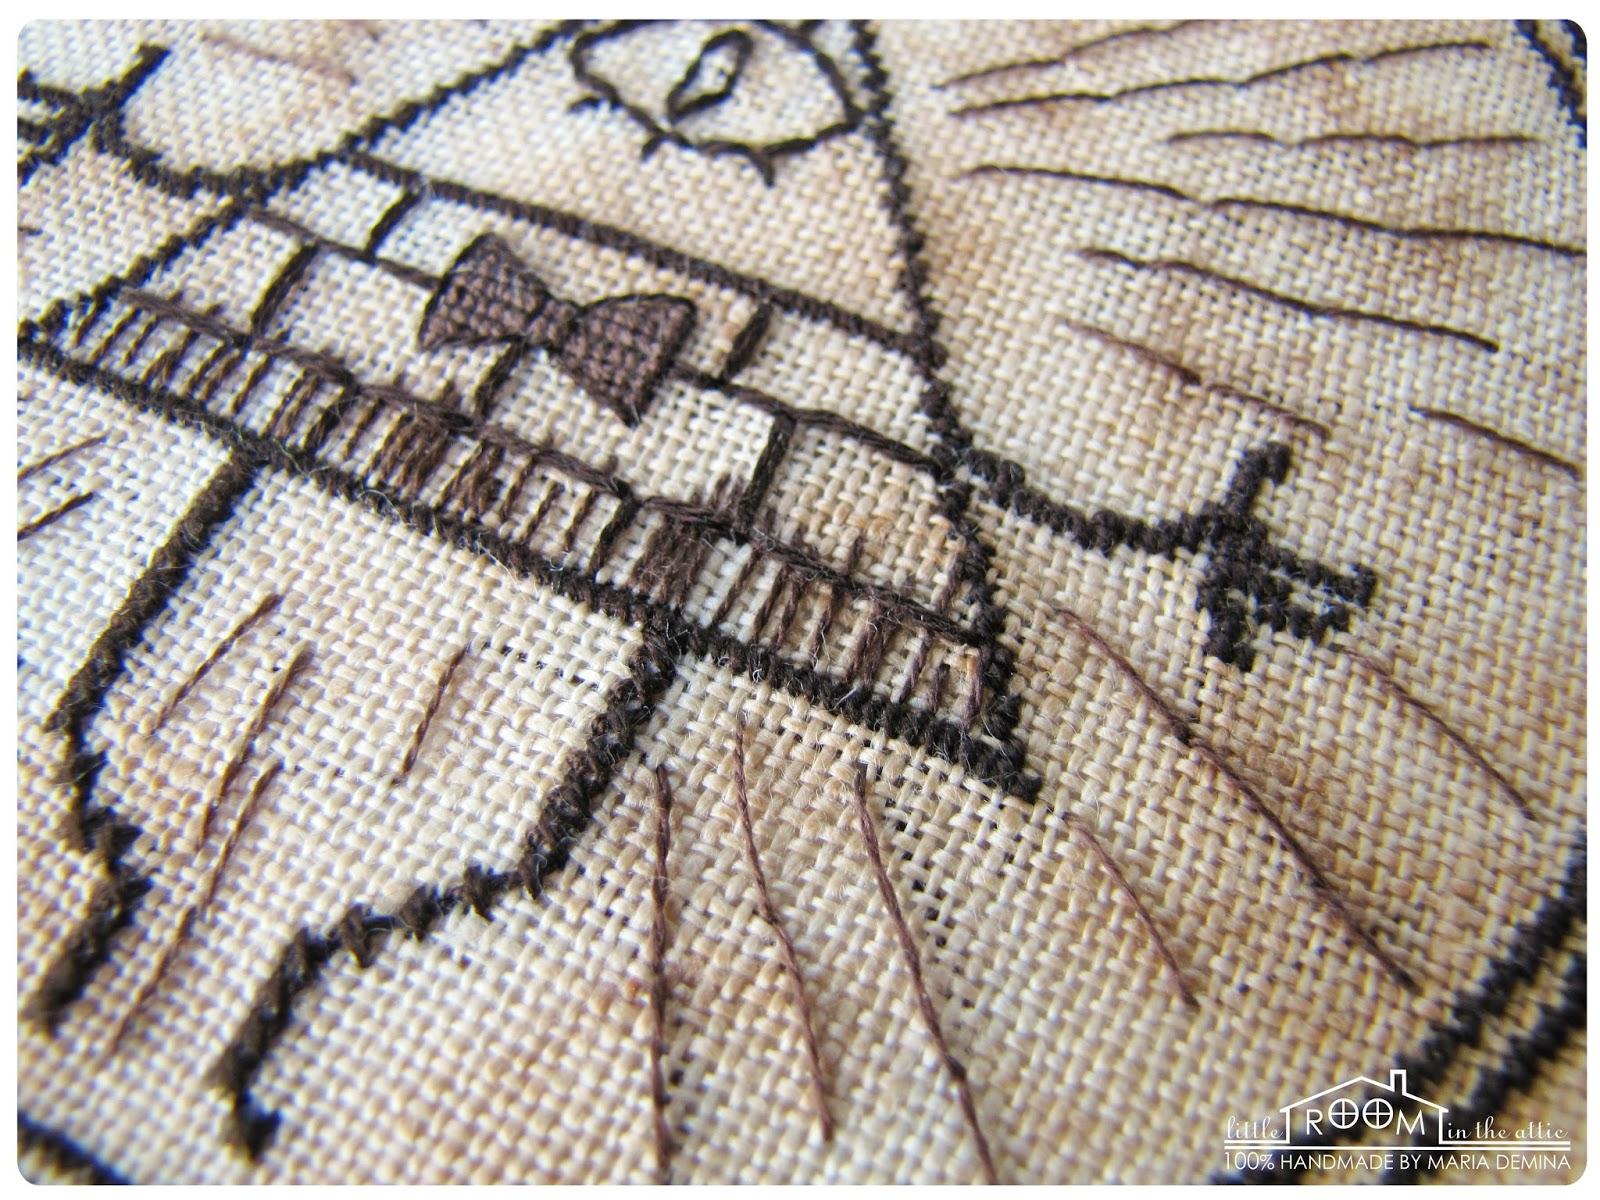 Гравити фолз схема вышивки крестом